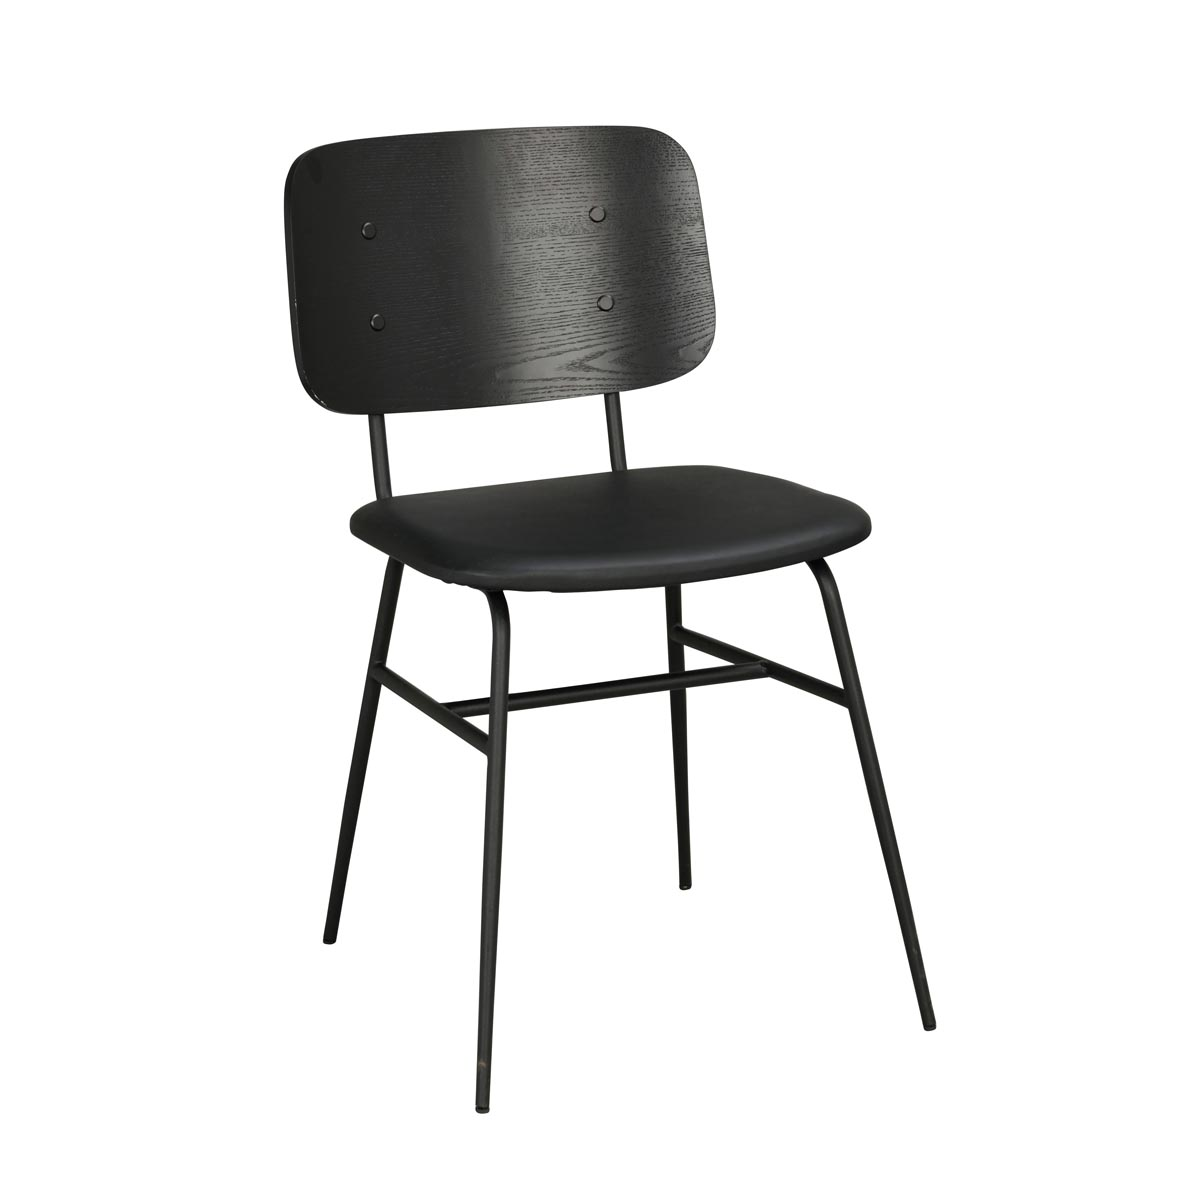 Brent-stol-svart_svart-R-118977_b